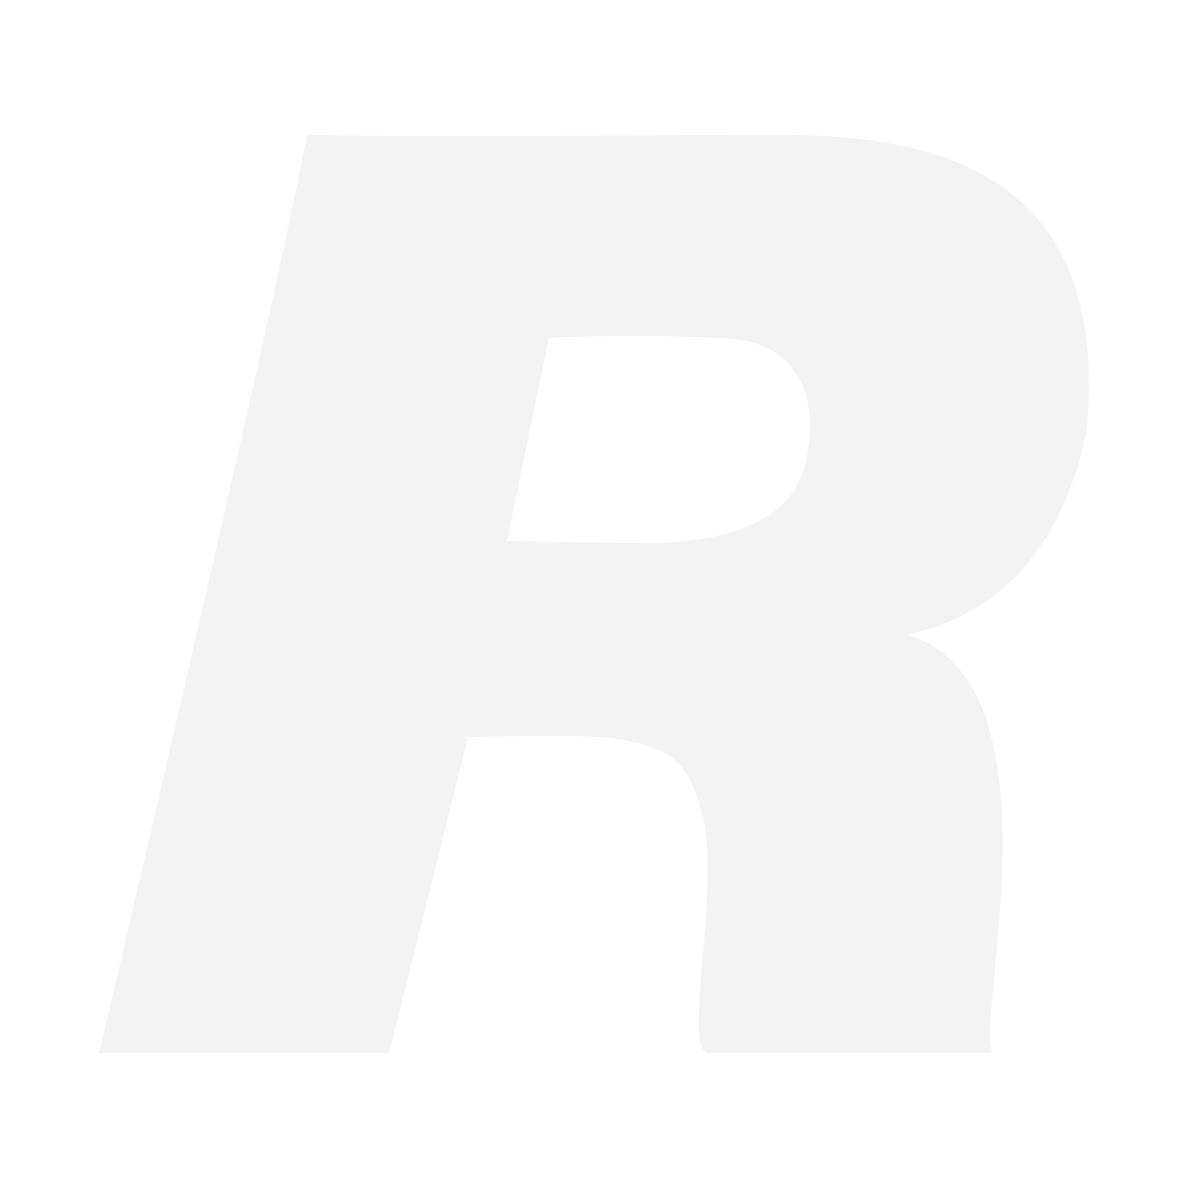 GoPro Rechargeable Battery (Hero5 Black, Hero6 Black, Hero7 Black, Hero New)